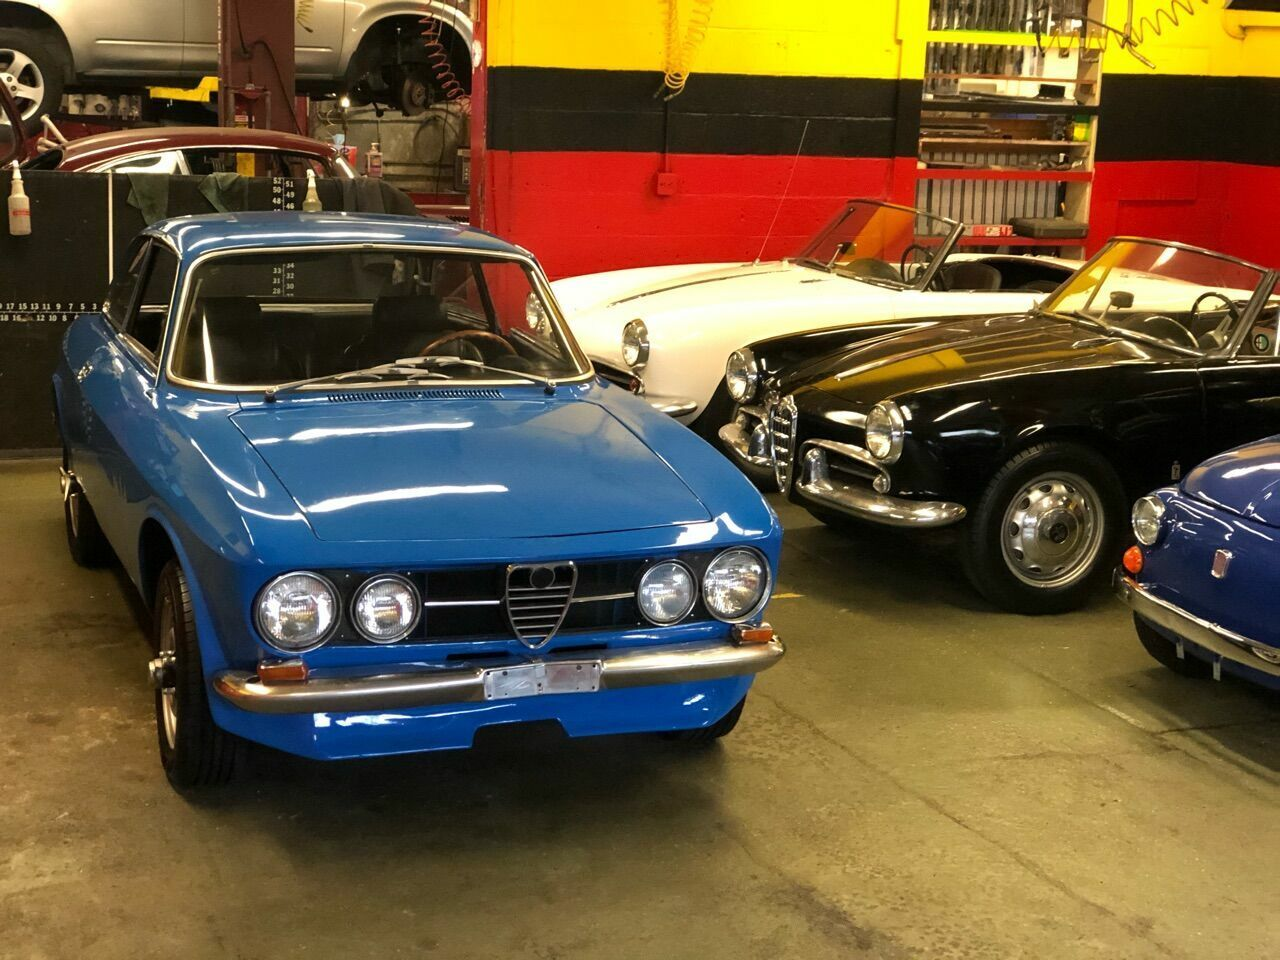 1969 Alfa Romeo GTV 1750 1969 ALFA ROMEO GTV 1750 *SERVICE RECORDS*LOW RESERVE*